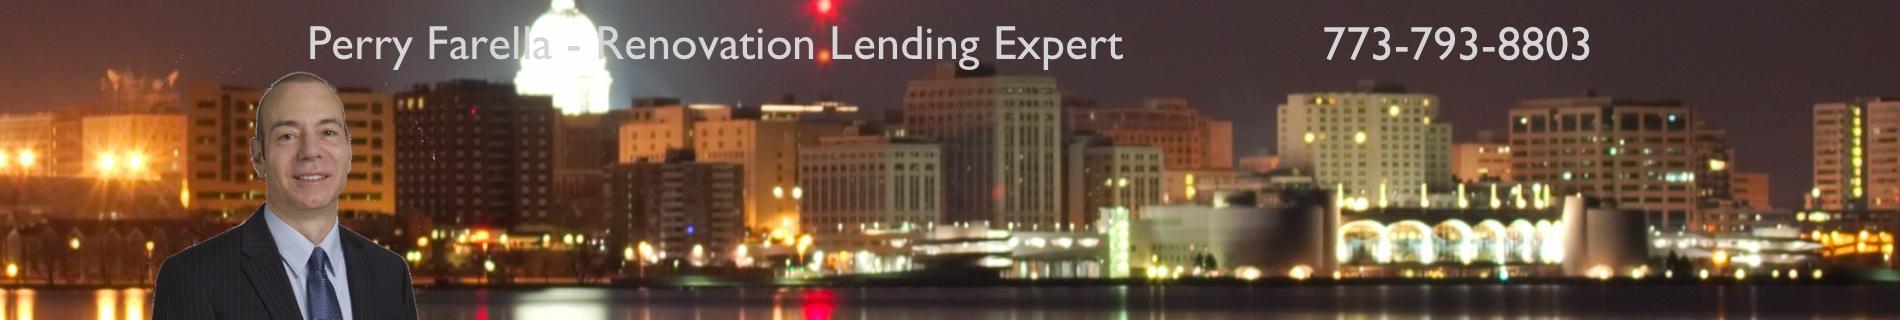 Perry-Farella-Madison-Renovation-Lending-Expert -1900x320